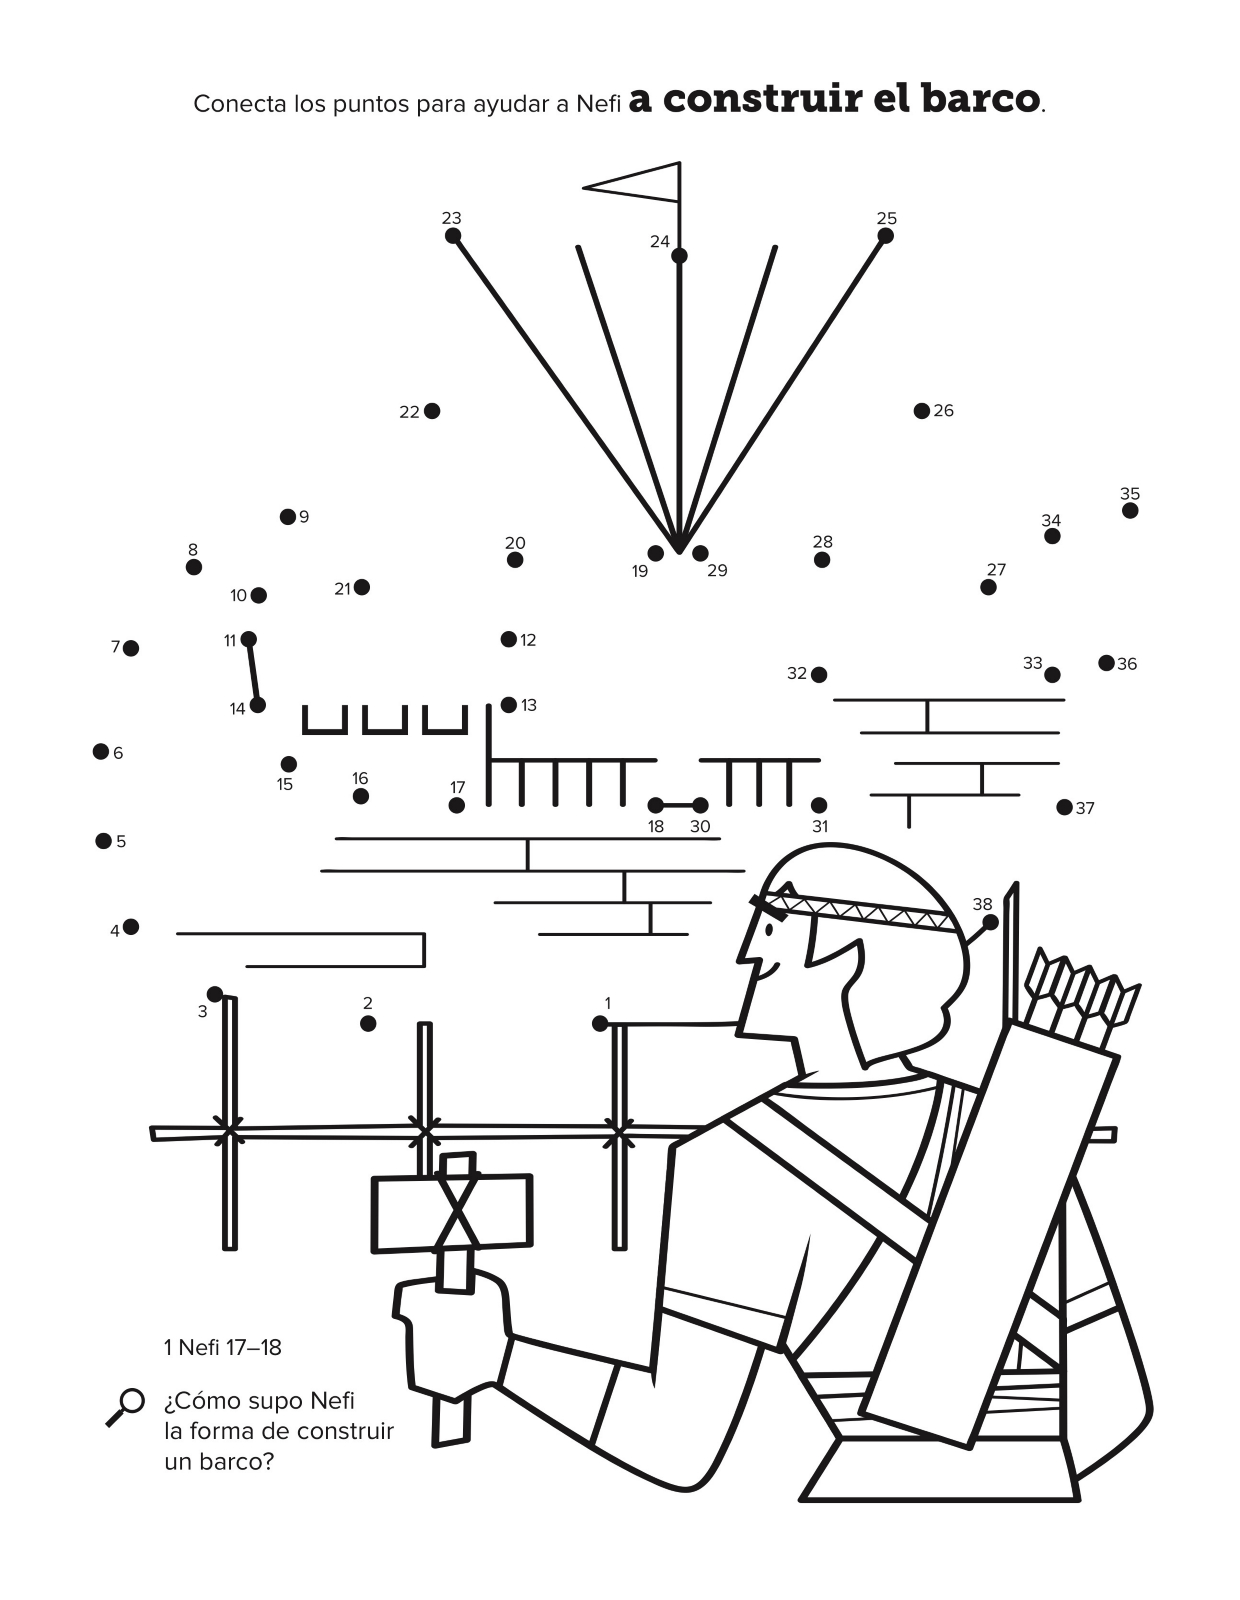 Nefi construye un barco